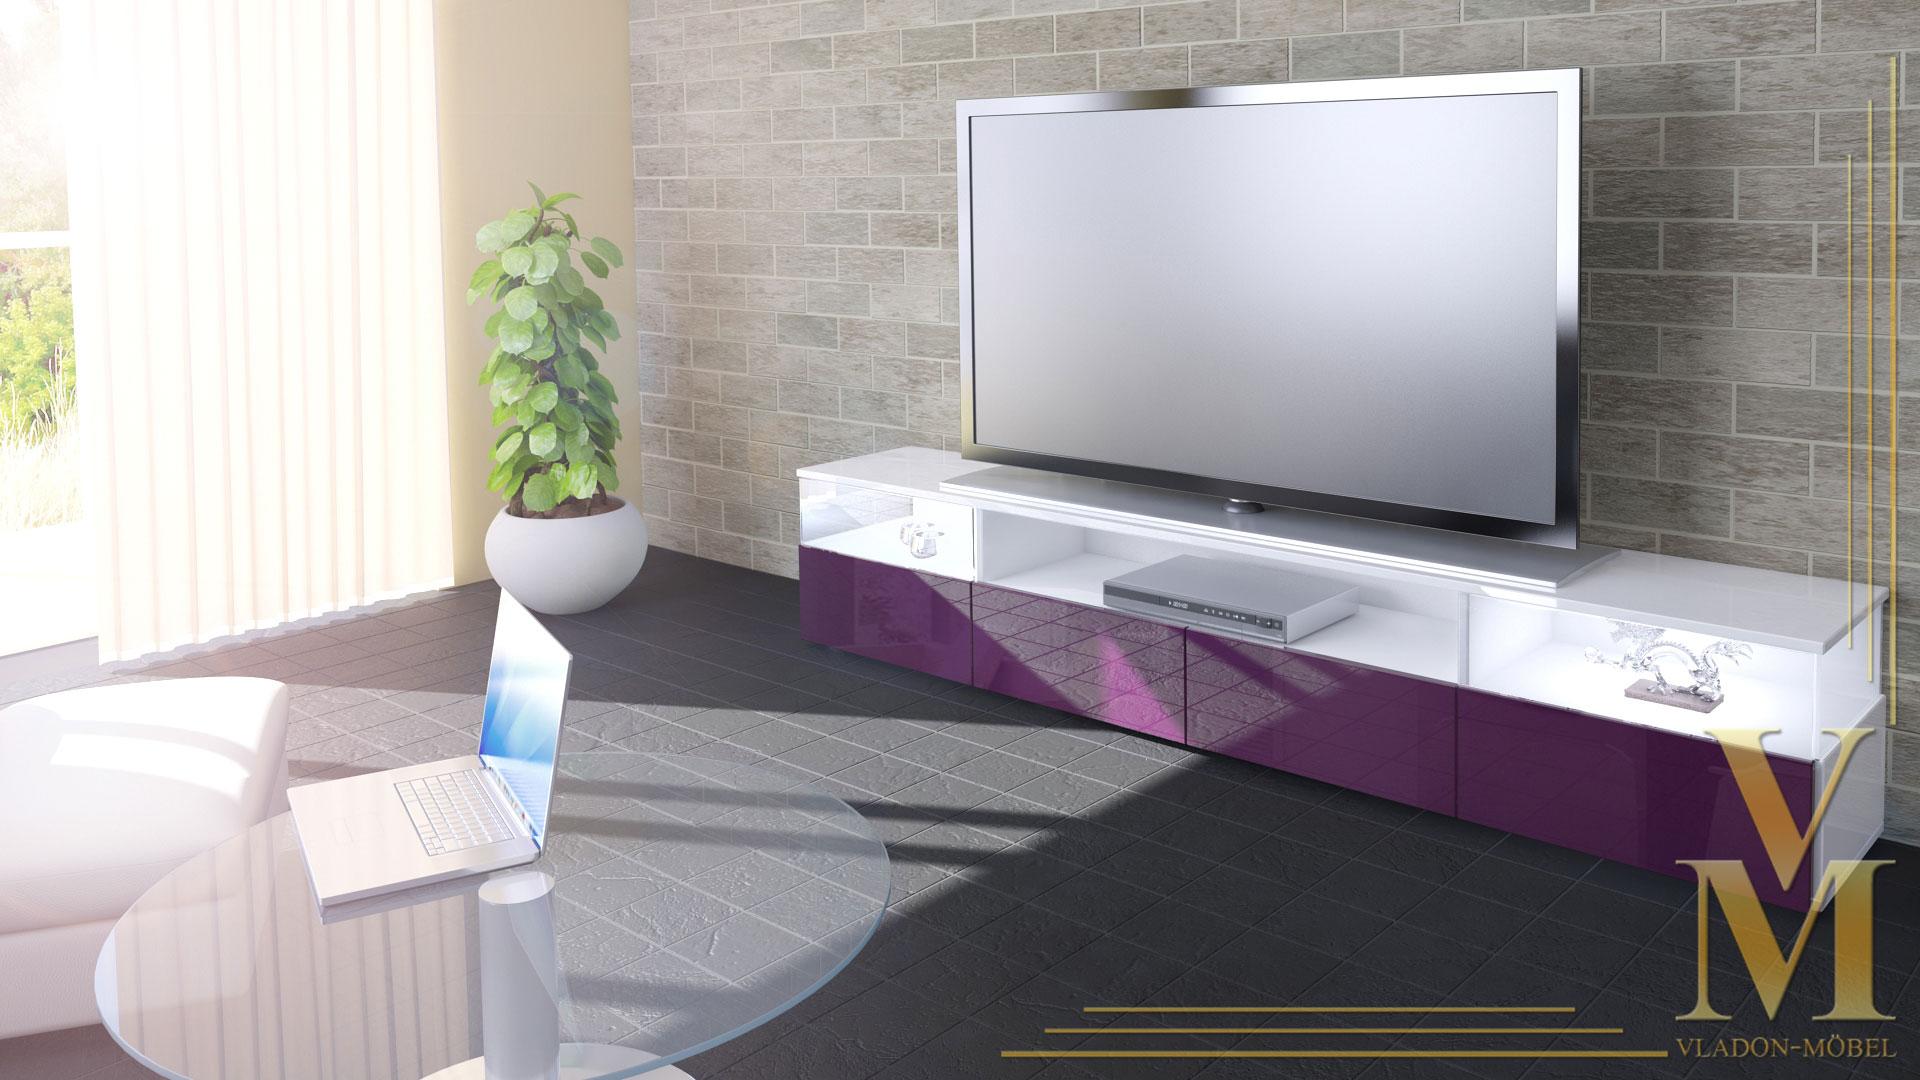 lowboard kommode tv board unterschrank almeria v2 wei hochglanz naturt ne ebay. Black Bedroom Furniture Sets. Home Design Ideas